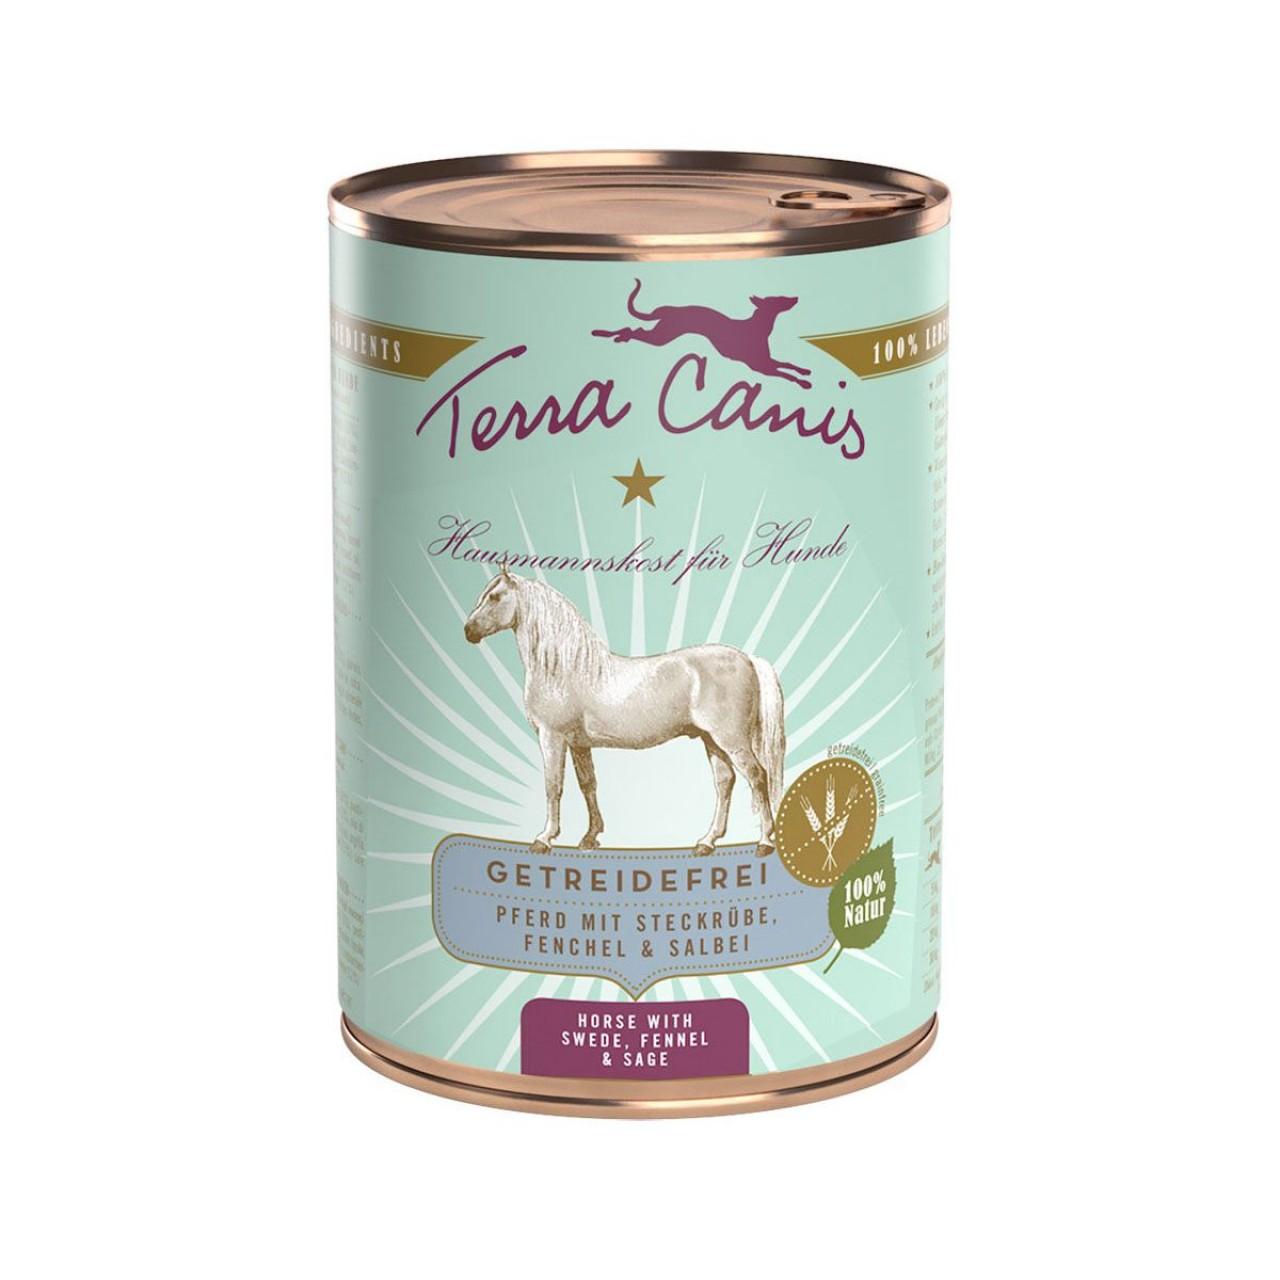 Terra Canis getreidefrei Pferd